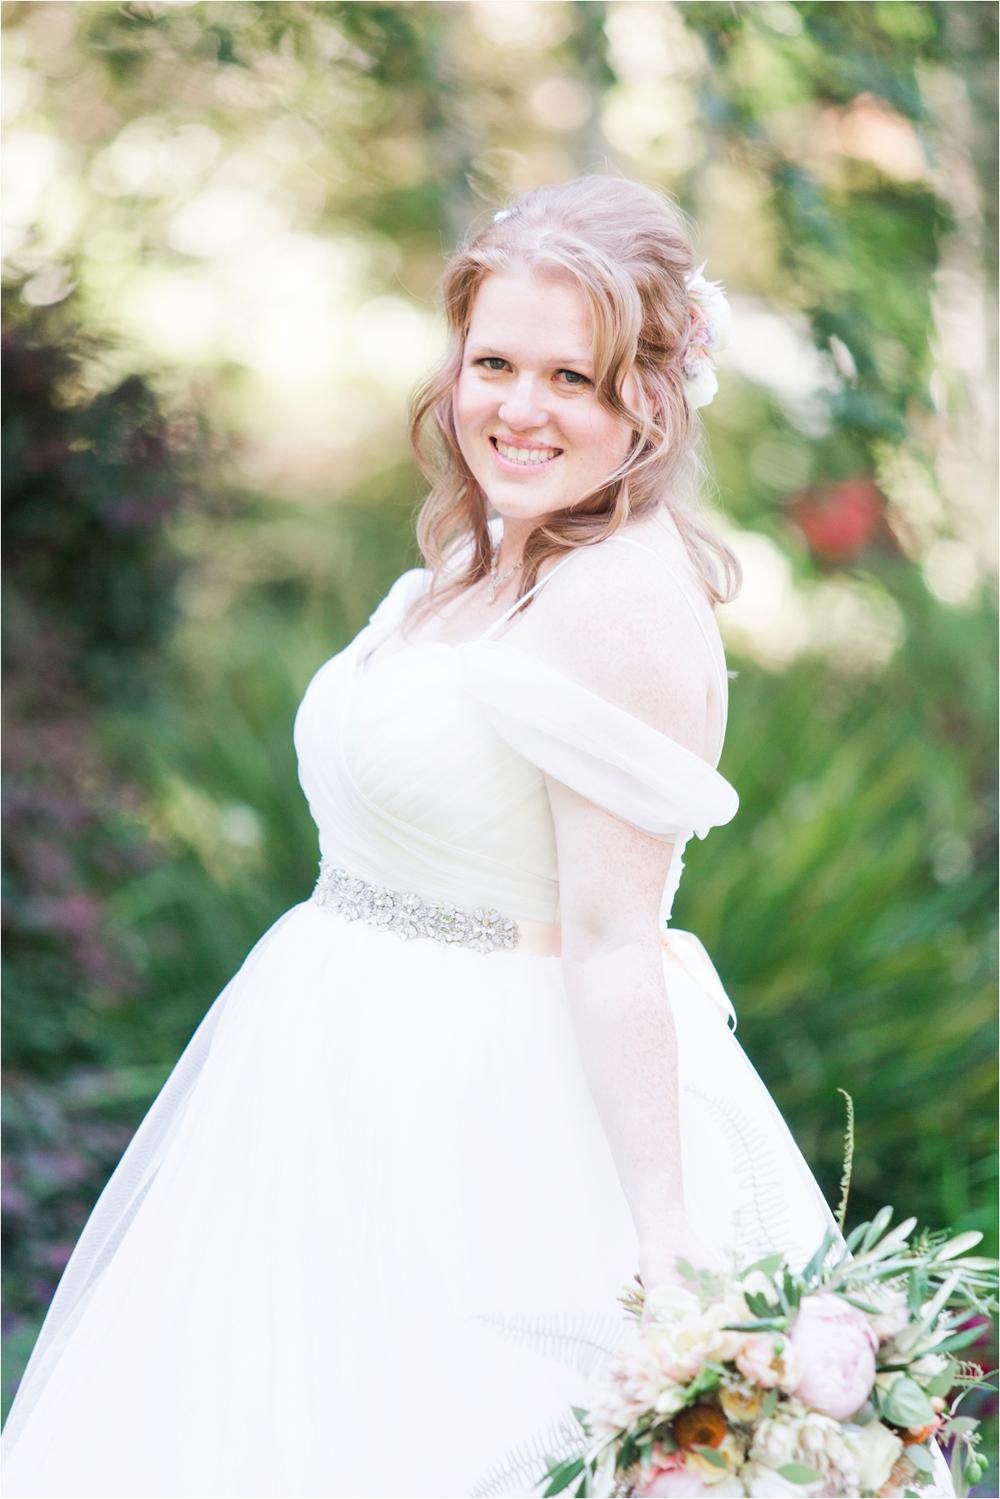 Nestldown wedding Photos by Briana Calderon Photography_0169.jpg